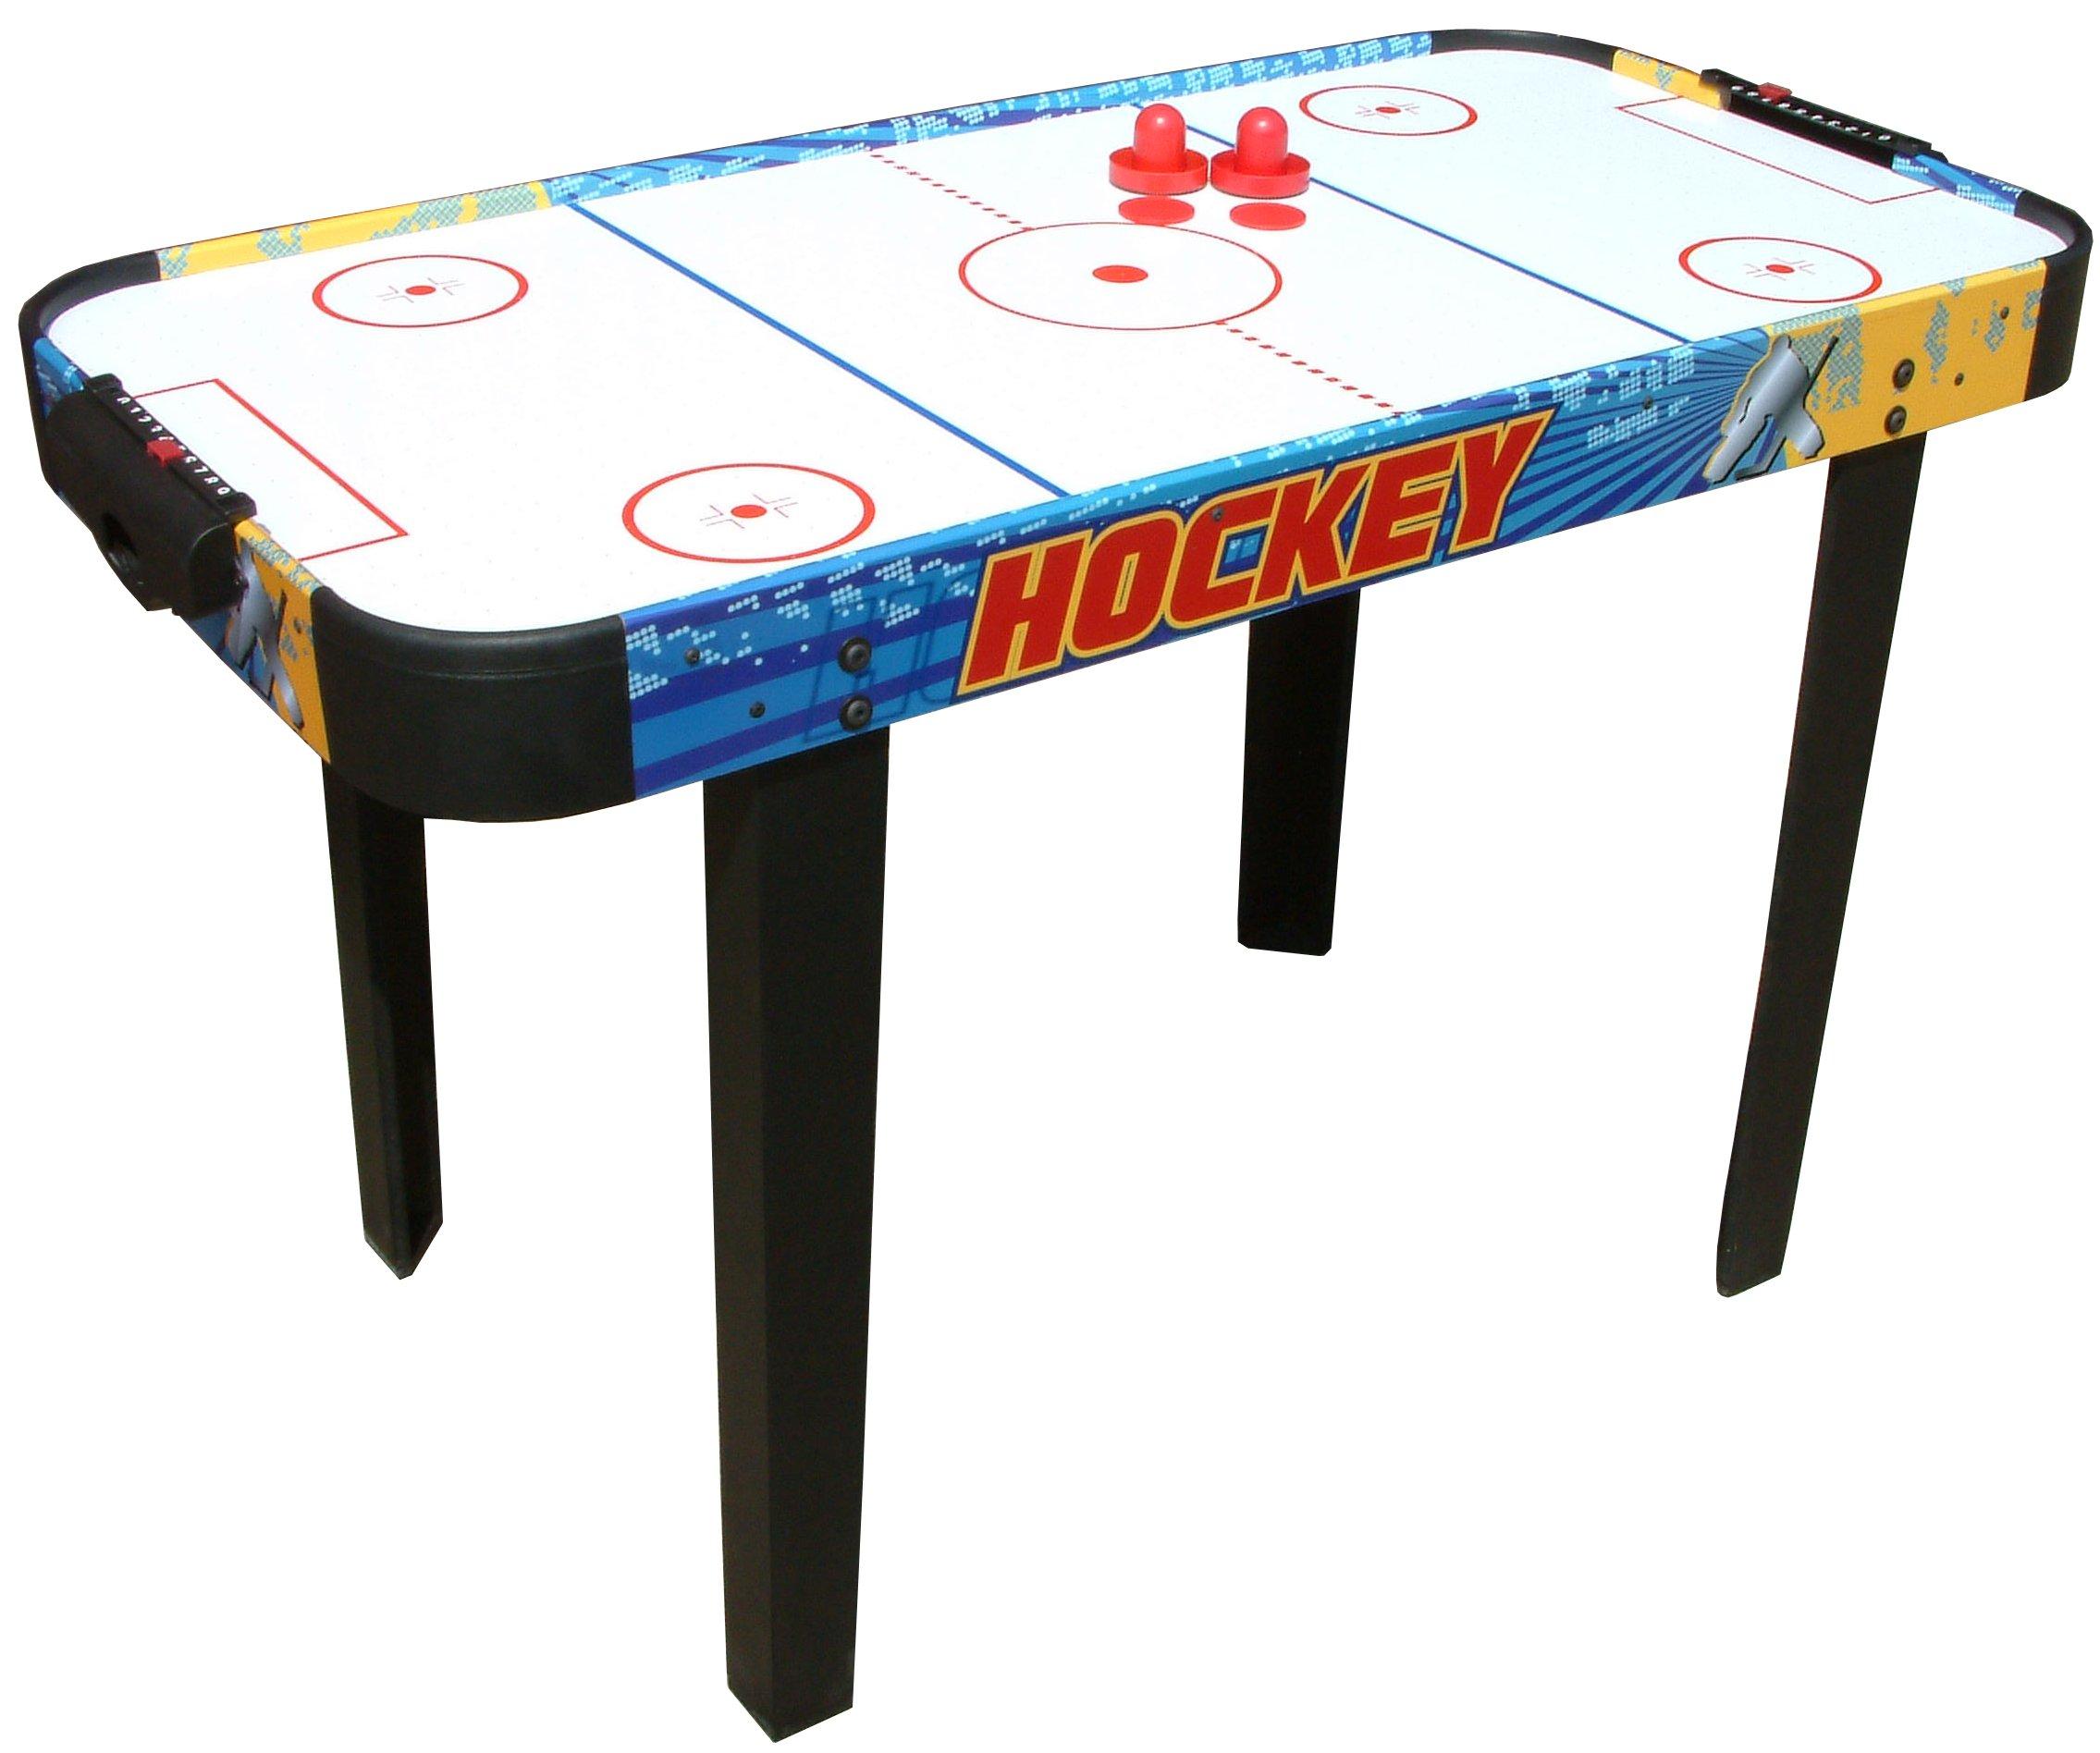 halex air hockey table manual